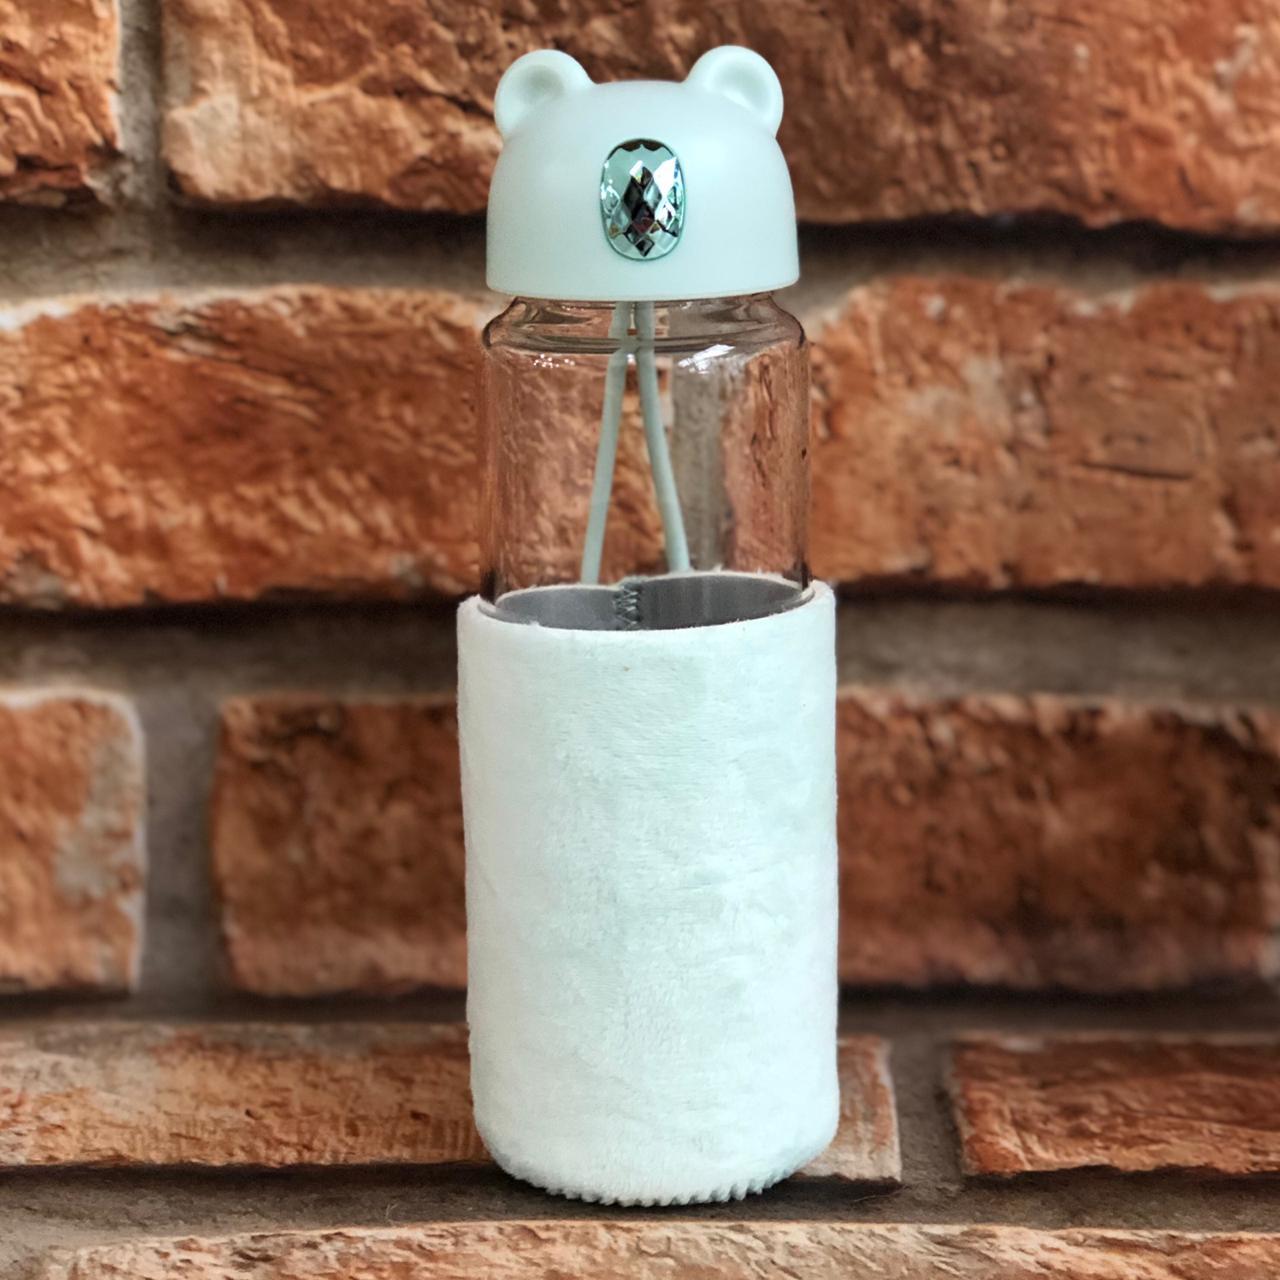 Garrafa de Vidro Urso com Capa de Silicone 350ml